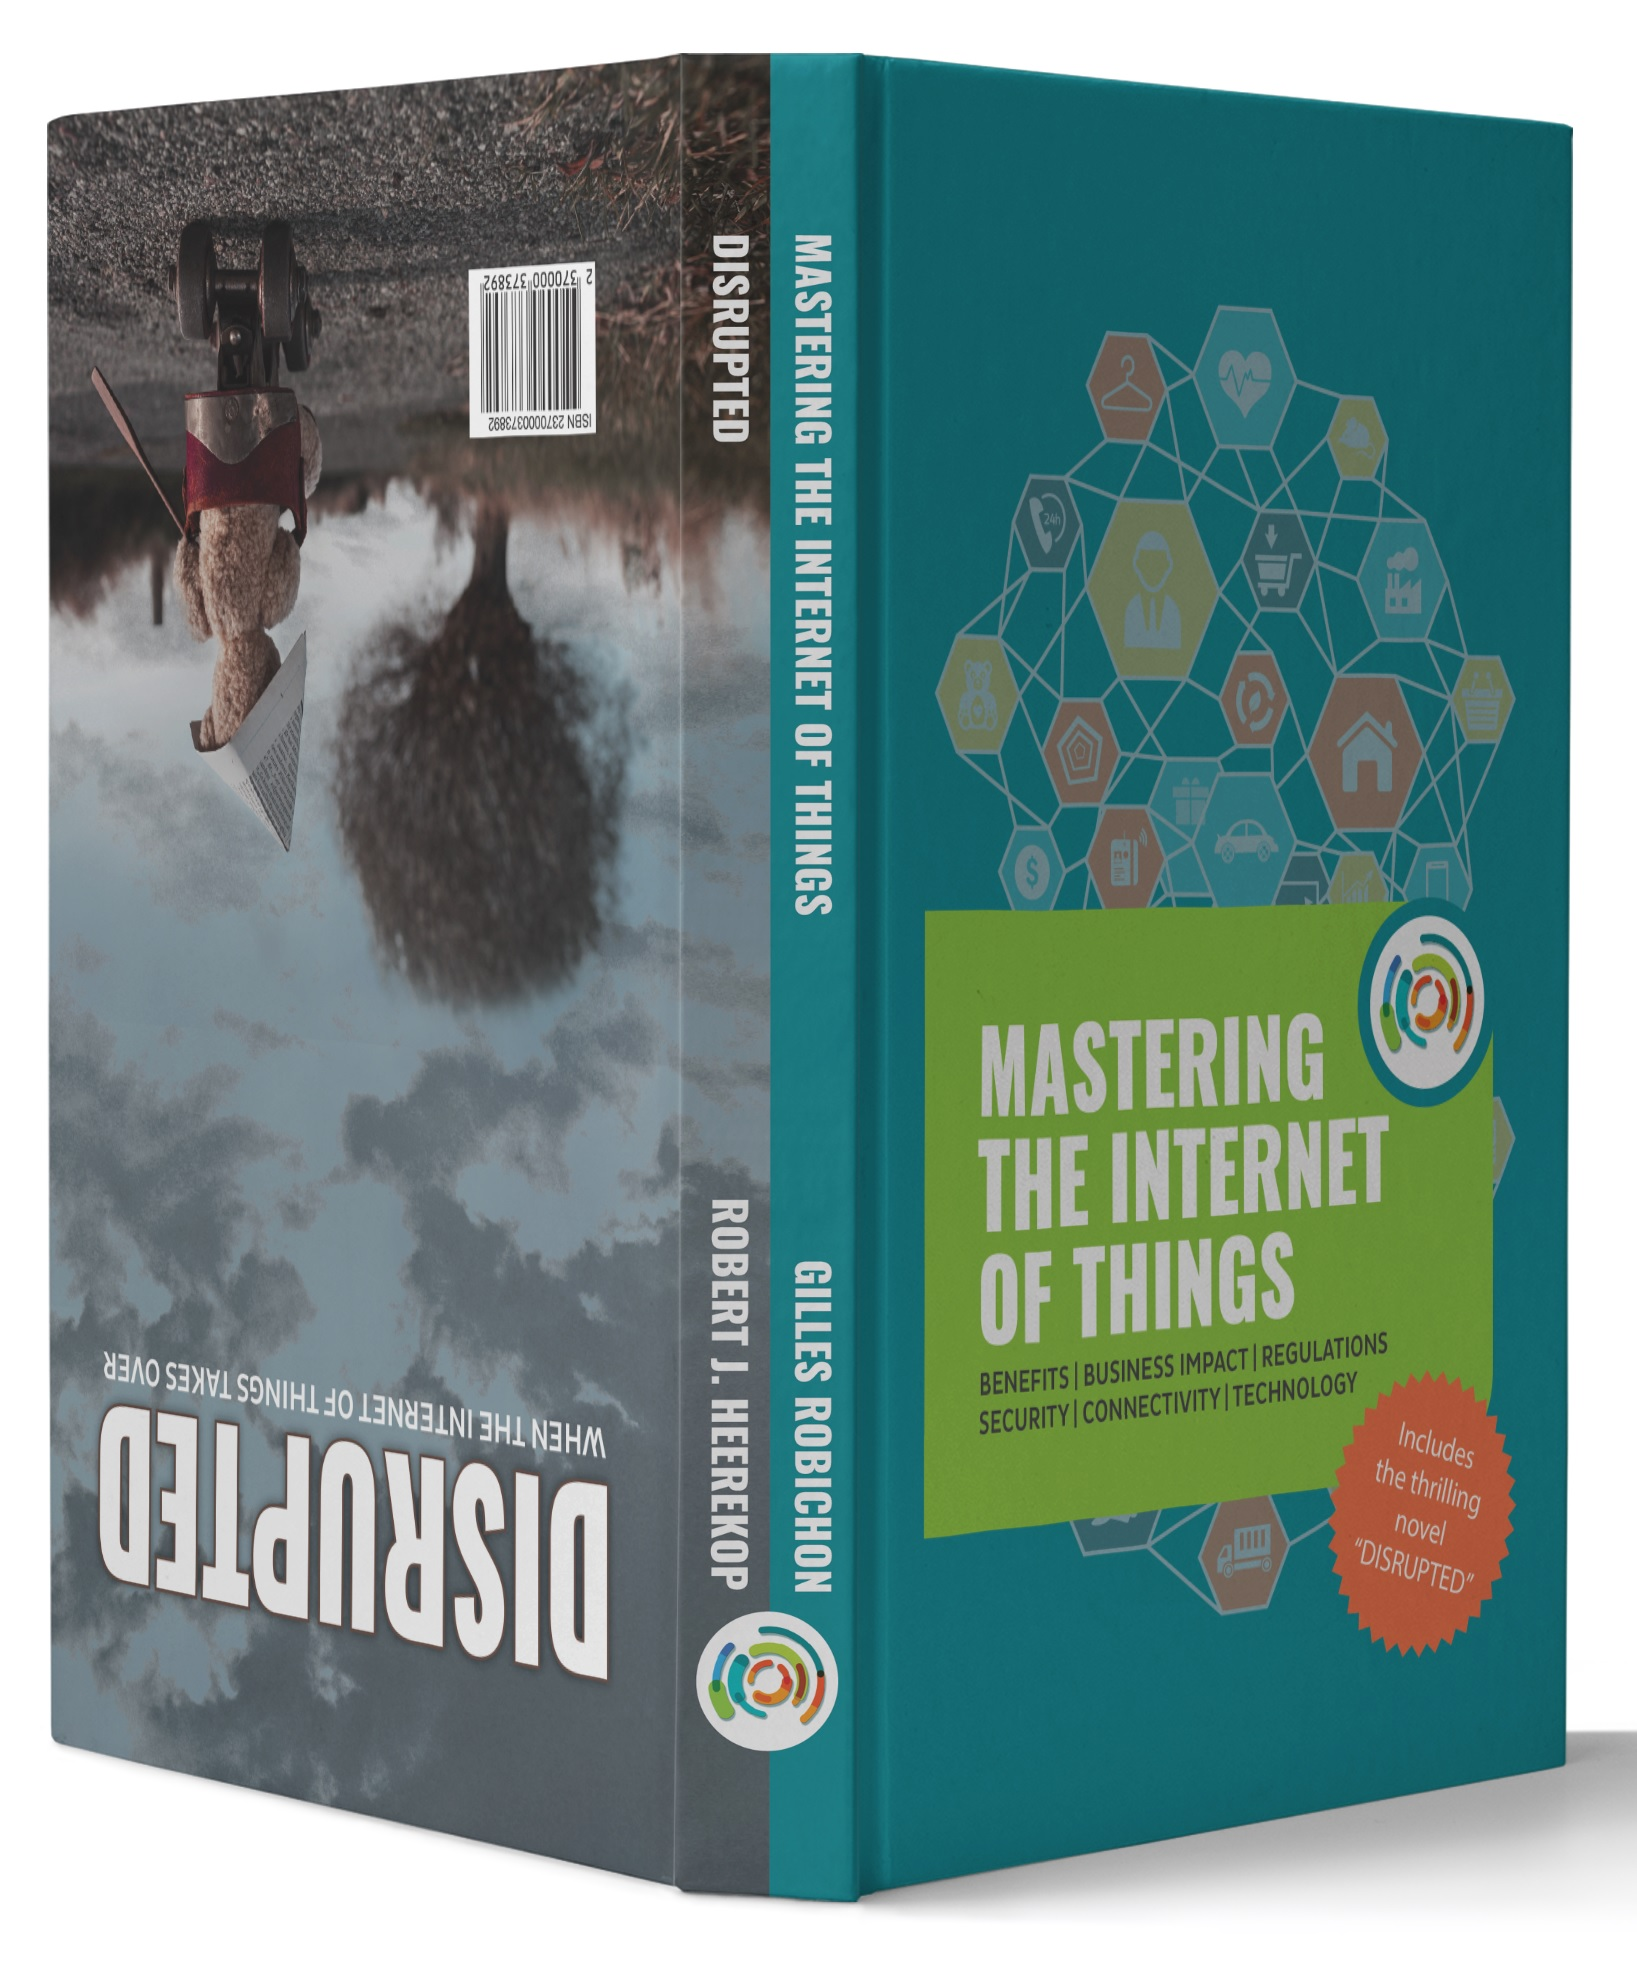 flipbook-iot-mastering-iot-disrupted